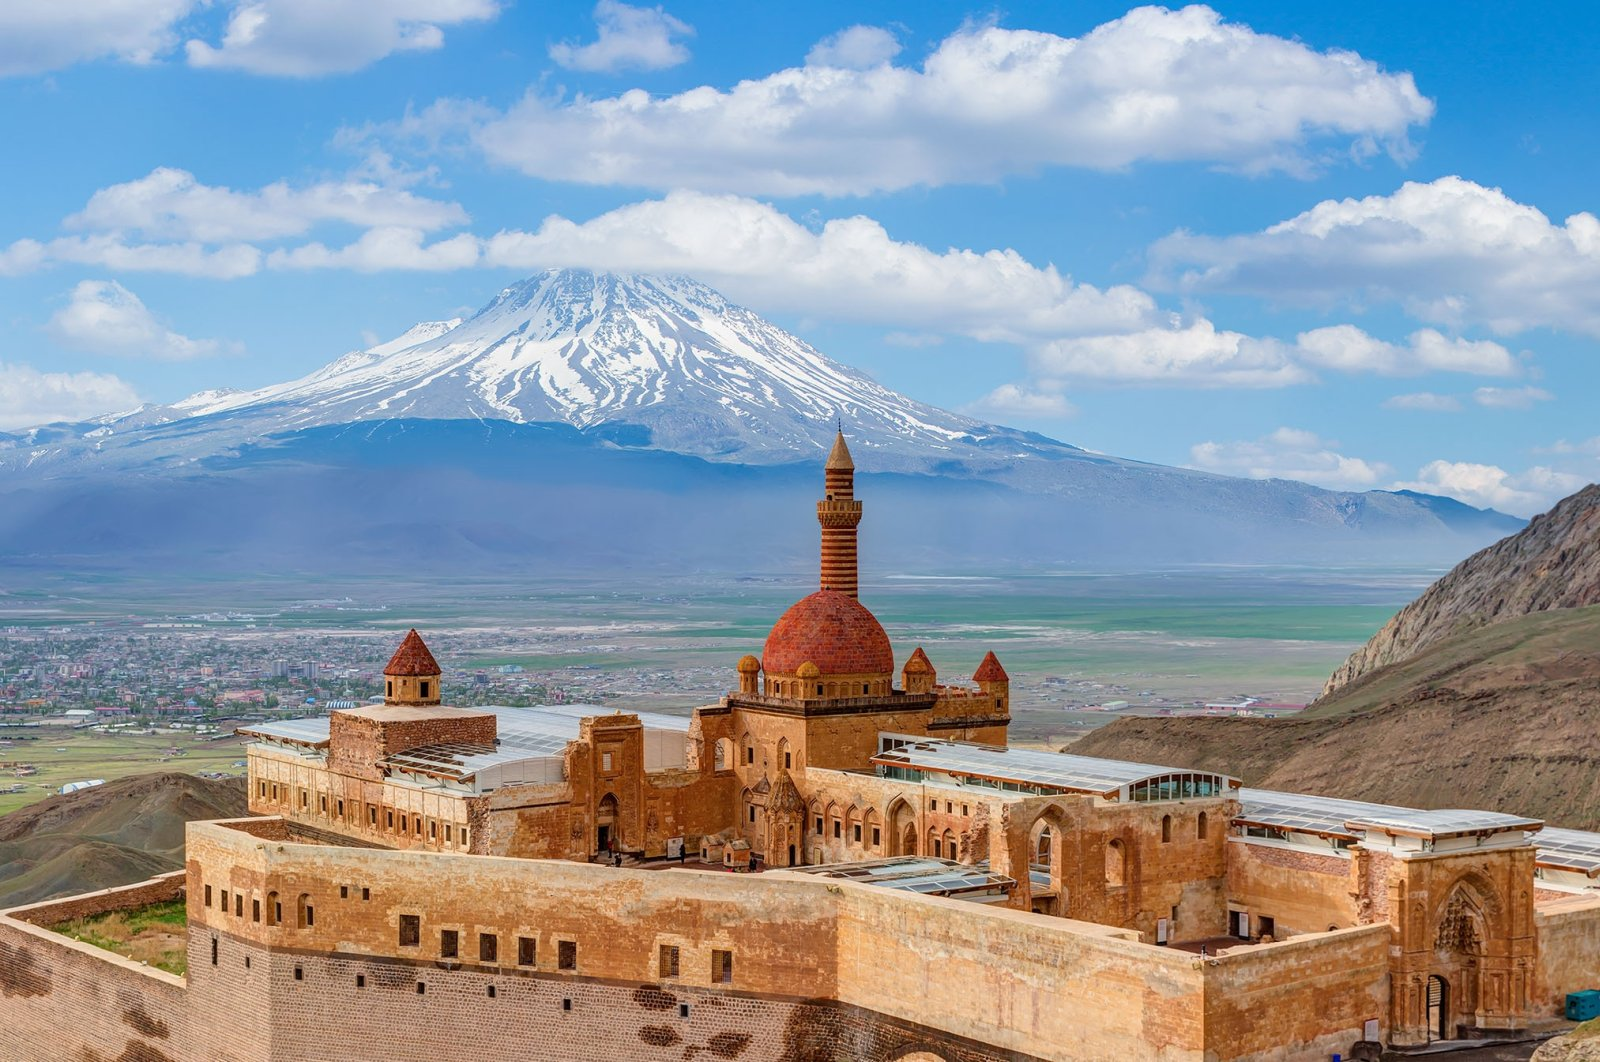 The courtyard of theIshak Pasha Palace can be seen inDoğubayazıt with Mount Ararat in the background, Ağrı, Turkey. (Shutterstock Photo)